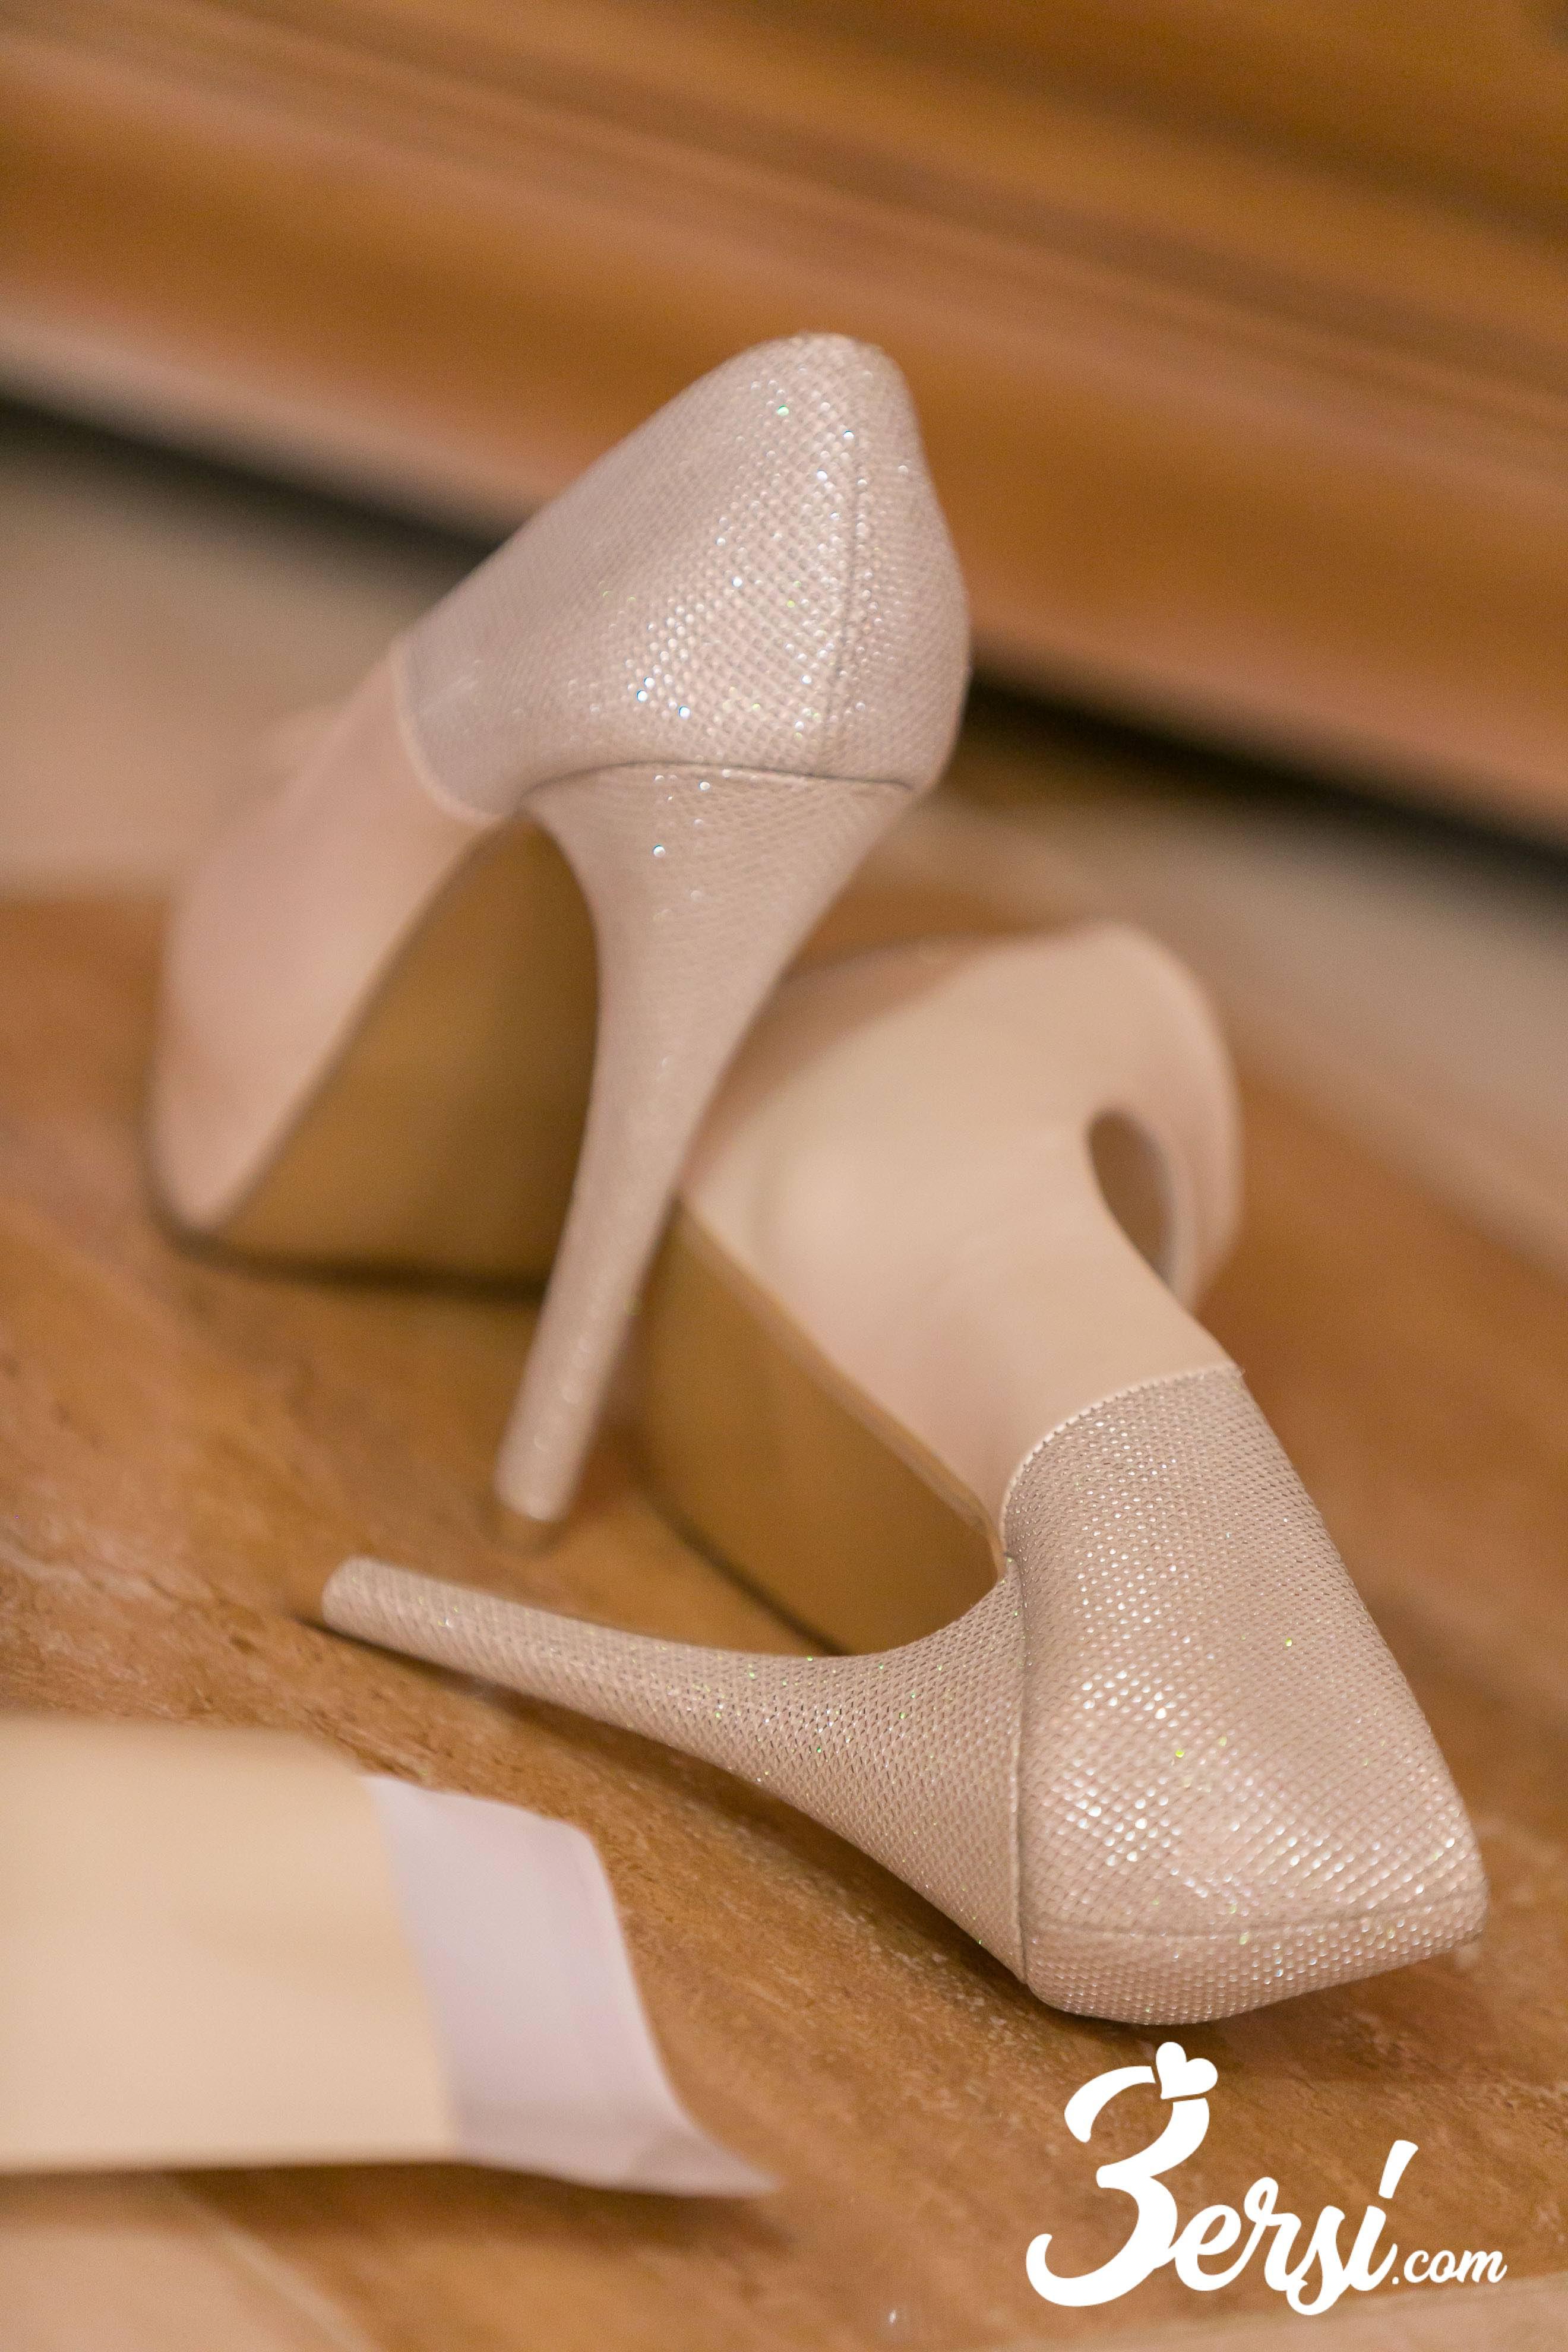 chaussures - indispensables tesdira - 3ersi